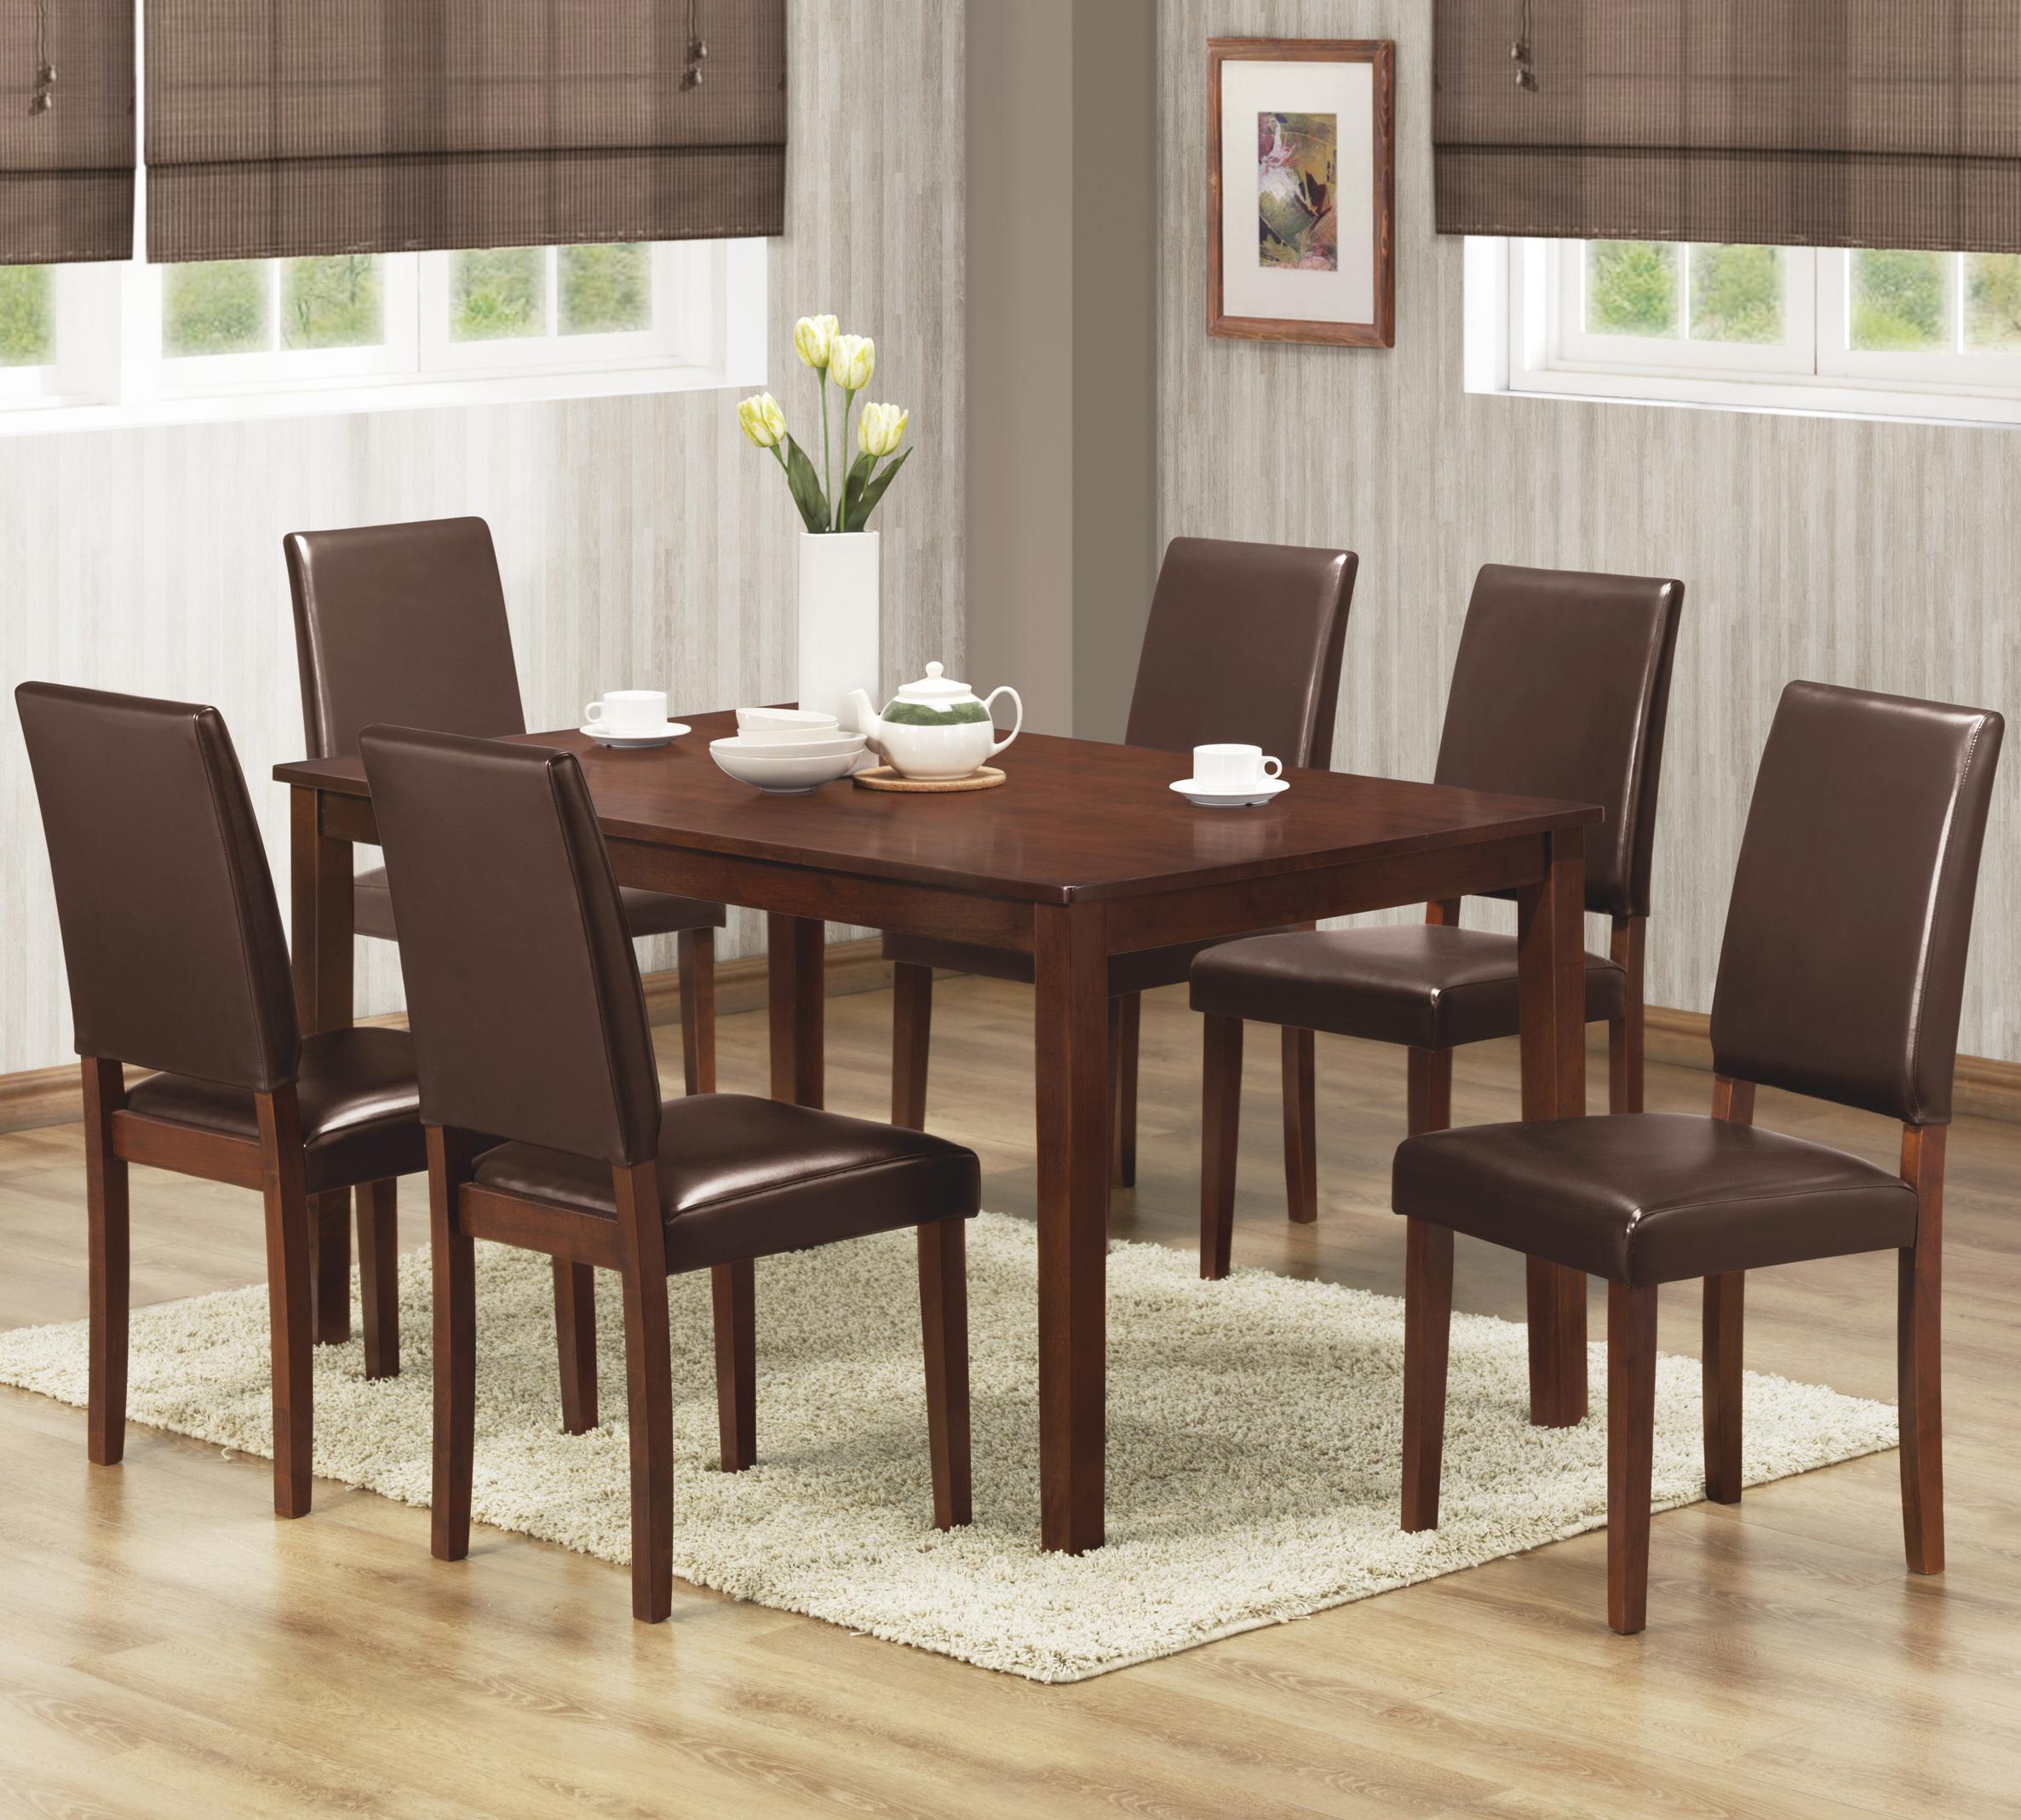 Derick 2708 Belfort Furniture Derick Dealer